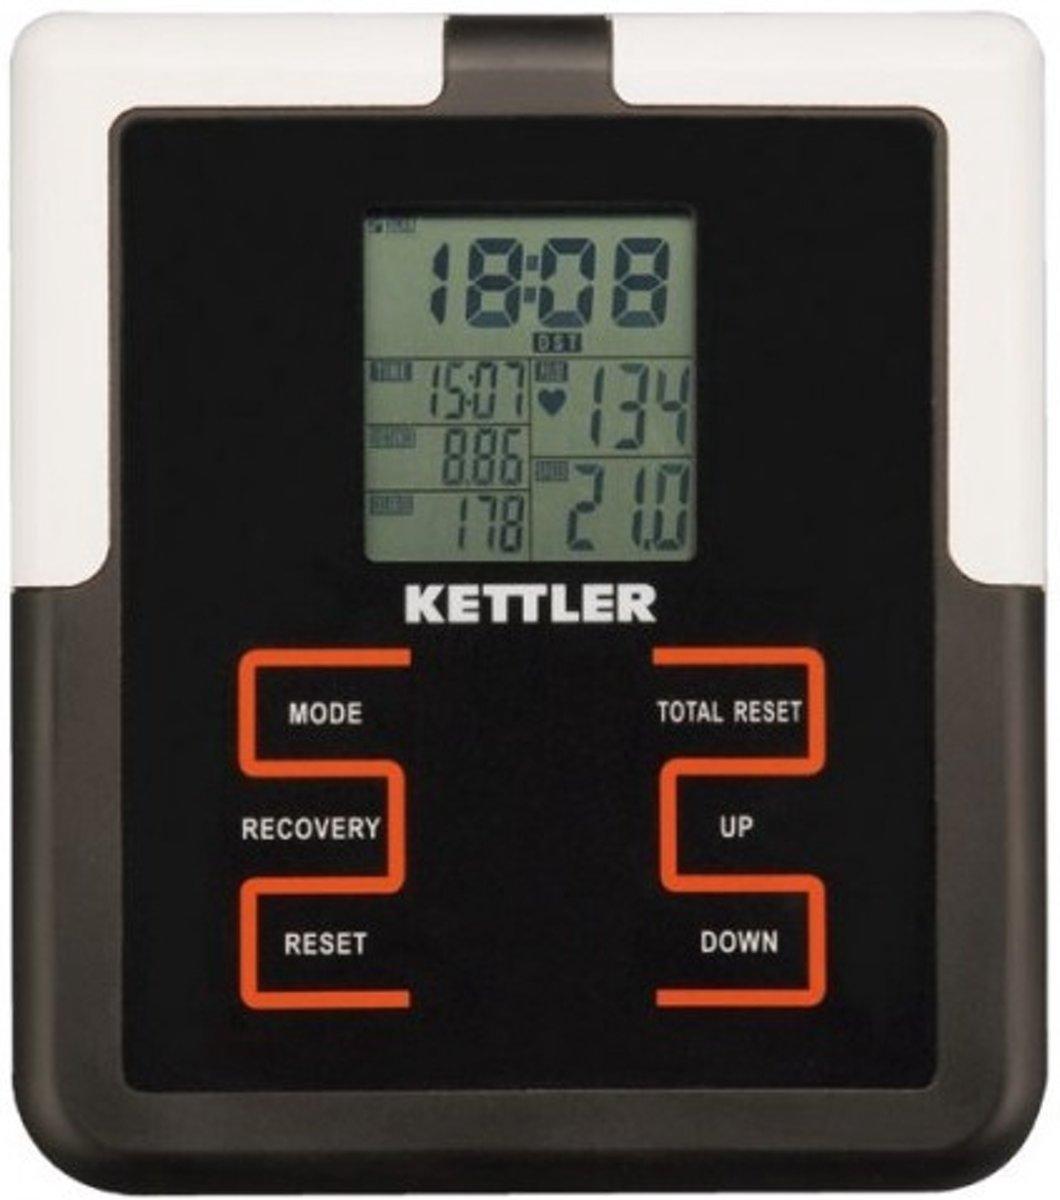 W superbly bol.com | Kettler Verso 109 - Crosstrainer - incl. hartslagfunctie SG26